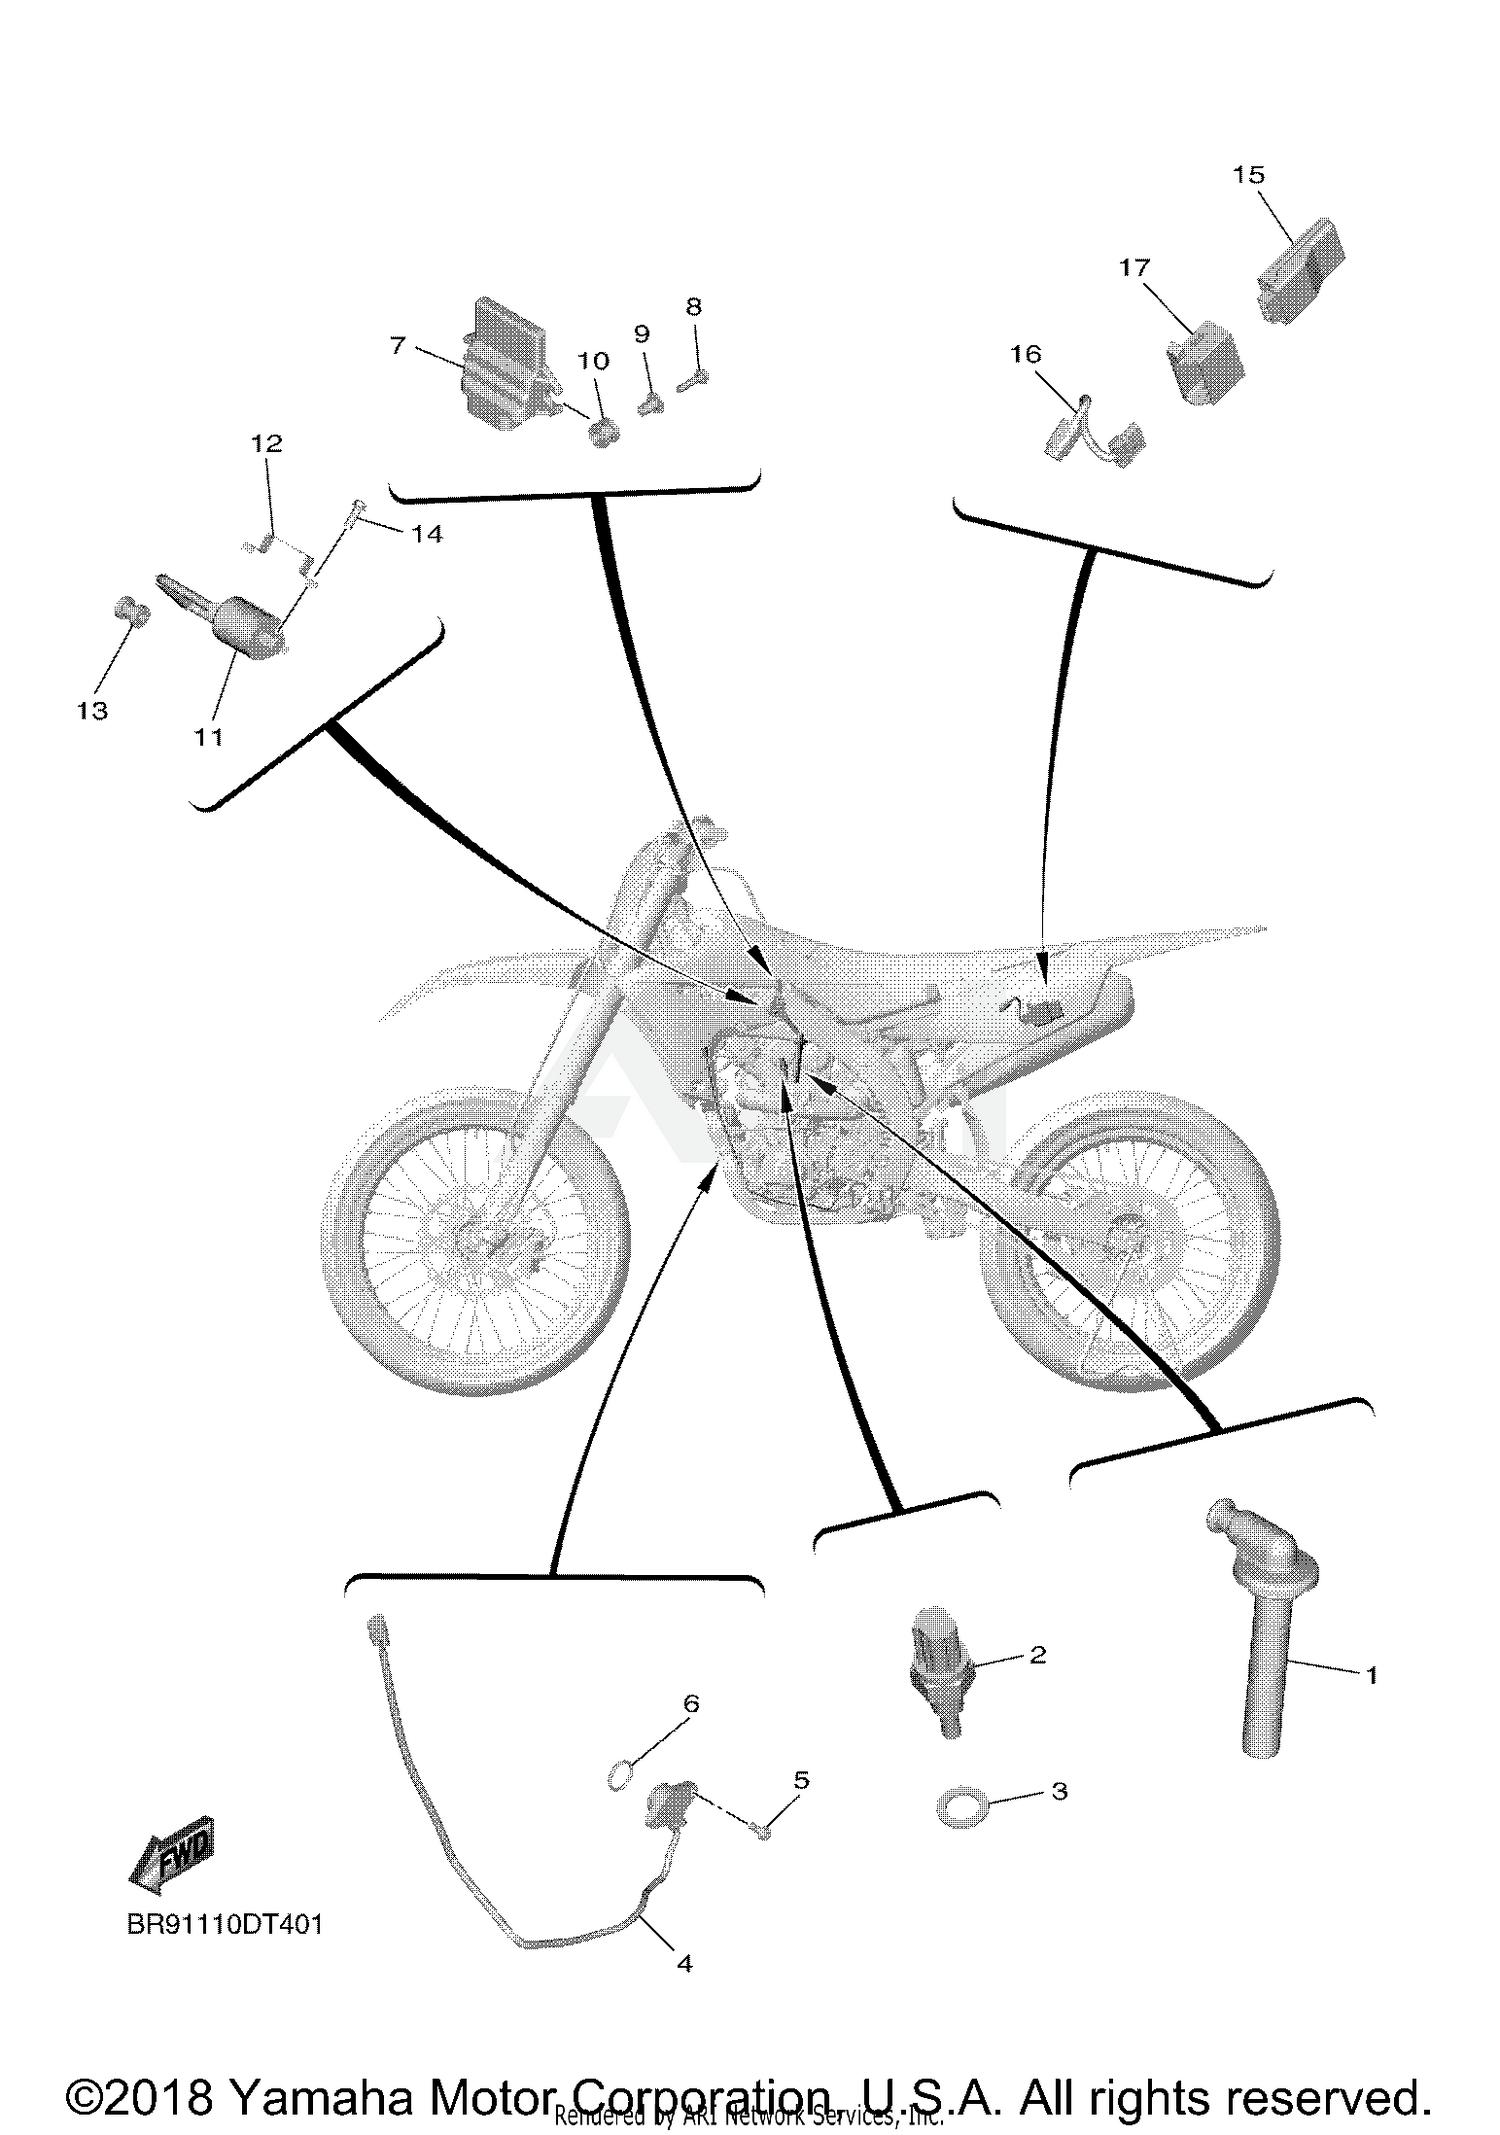 hight resolution of yamaha bike diagram wiring diagram centre yamaha dirt bike wiring diagram 2019 yamaha yz450fx electrical 1